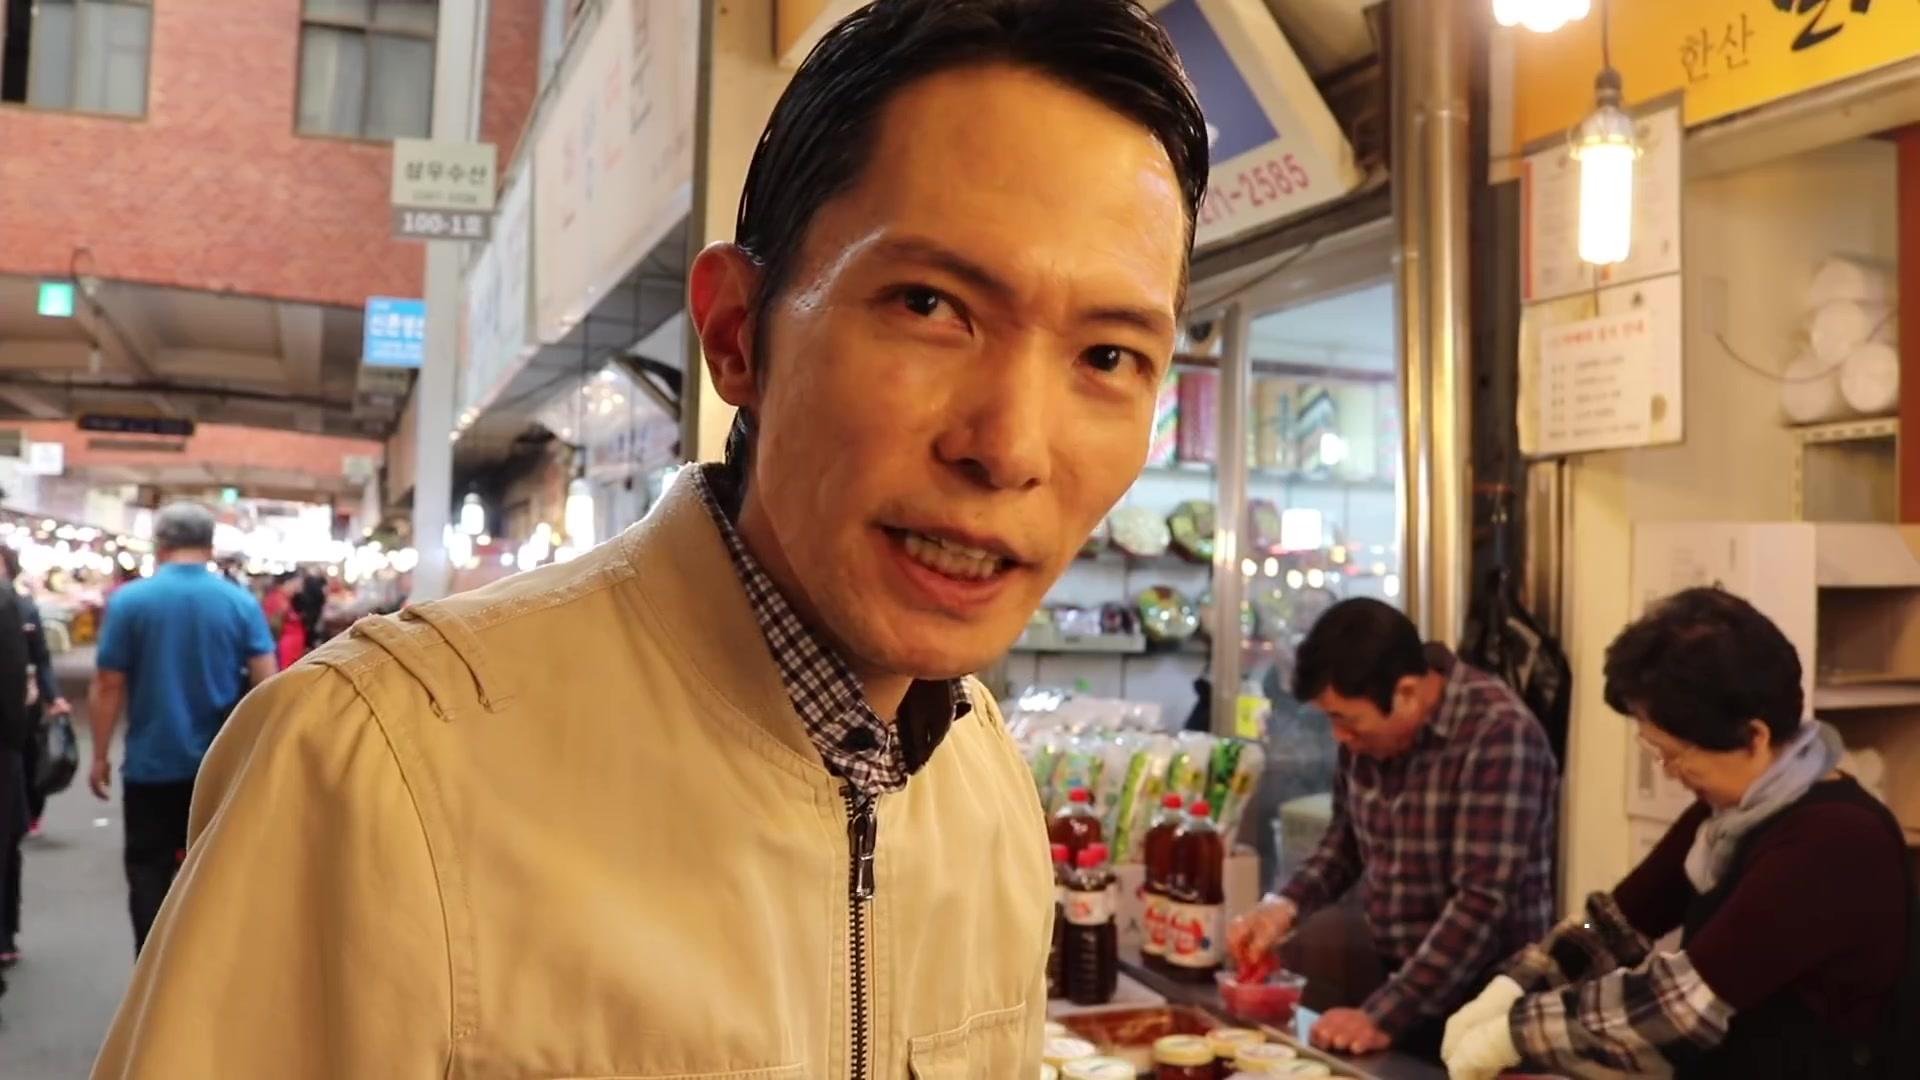 Todo Sobre Corea del Sur Episode 156: Seoul Gwangjang Market Food Tour